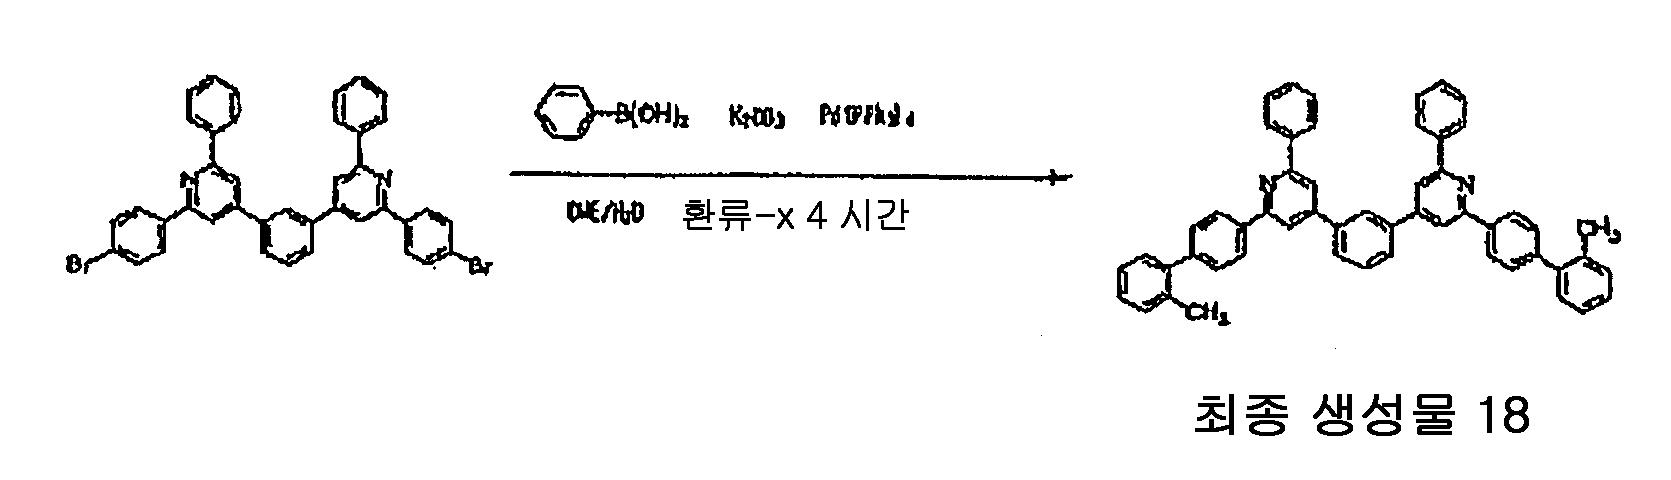 Figure 112010002231902-pat00113